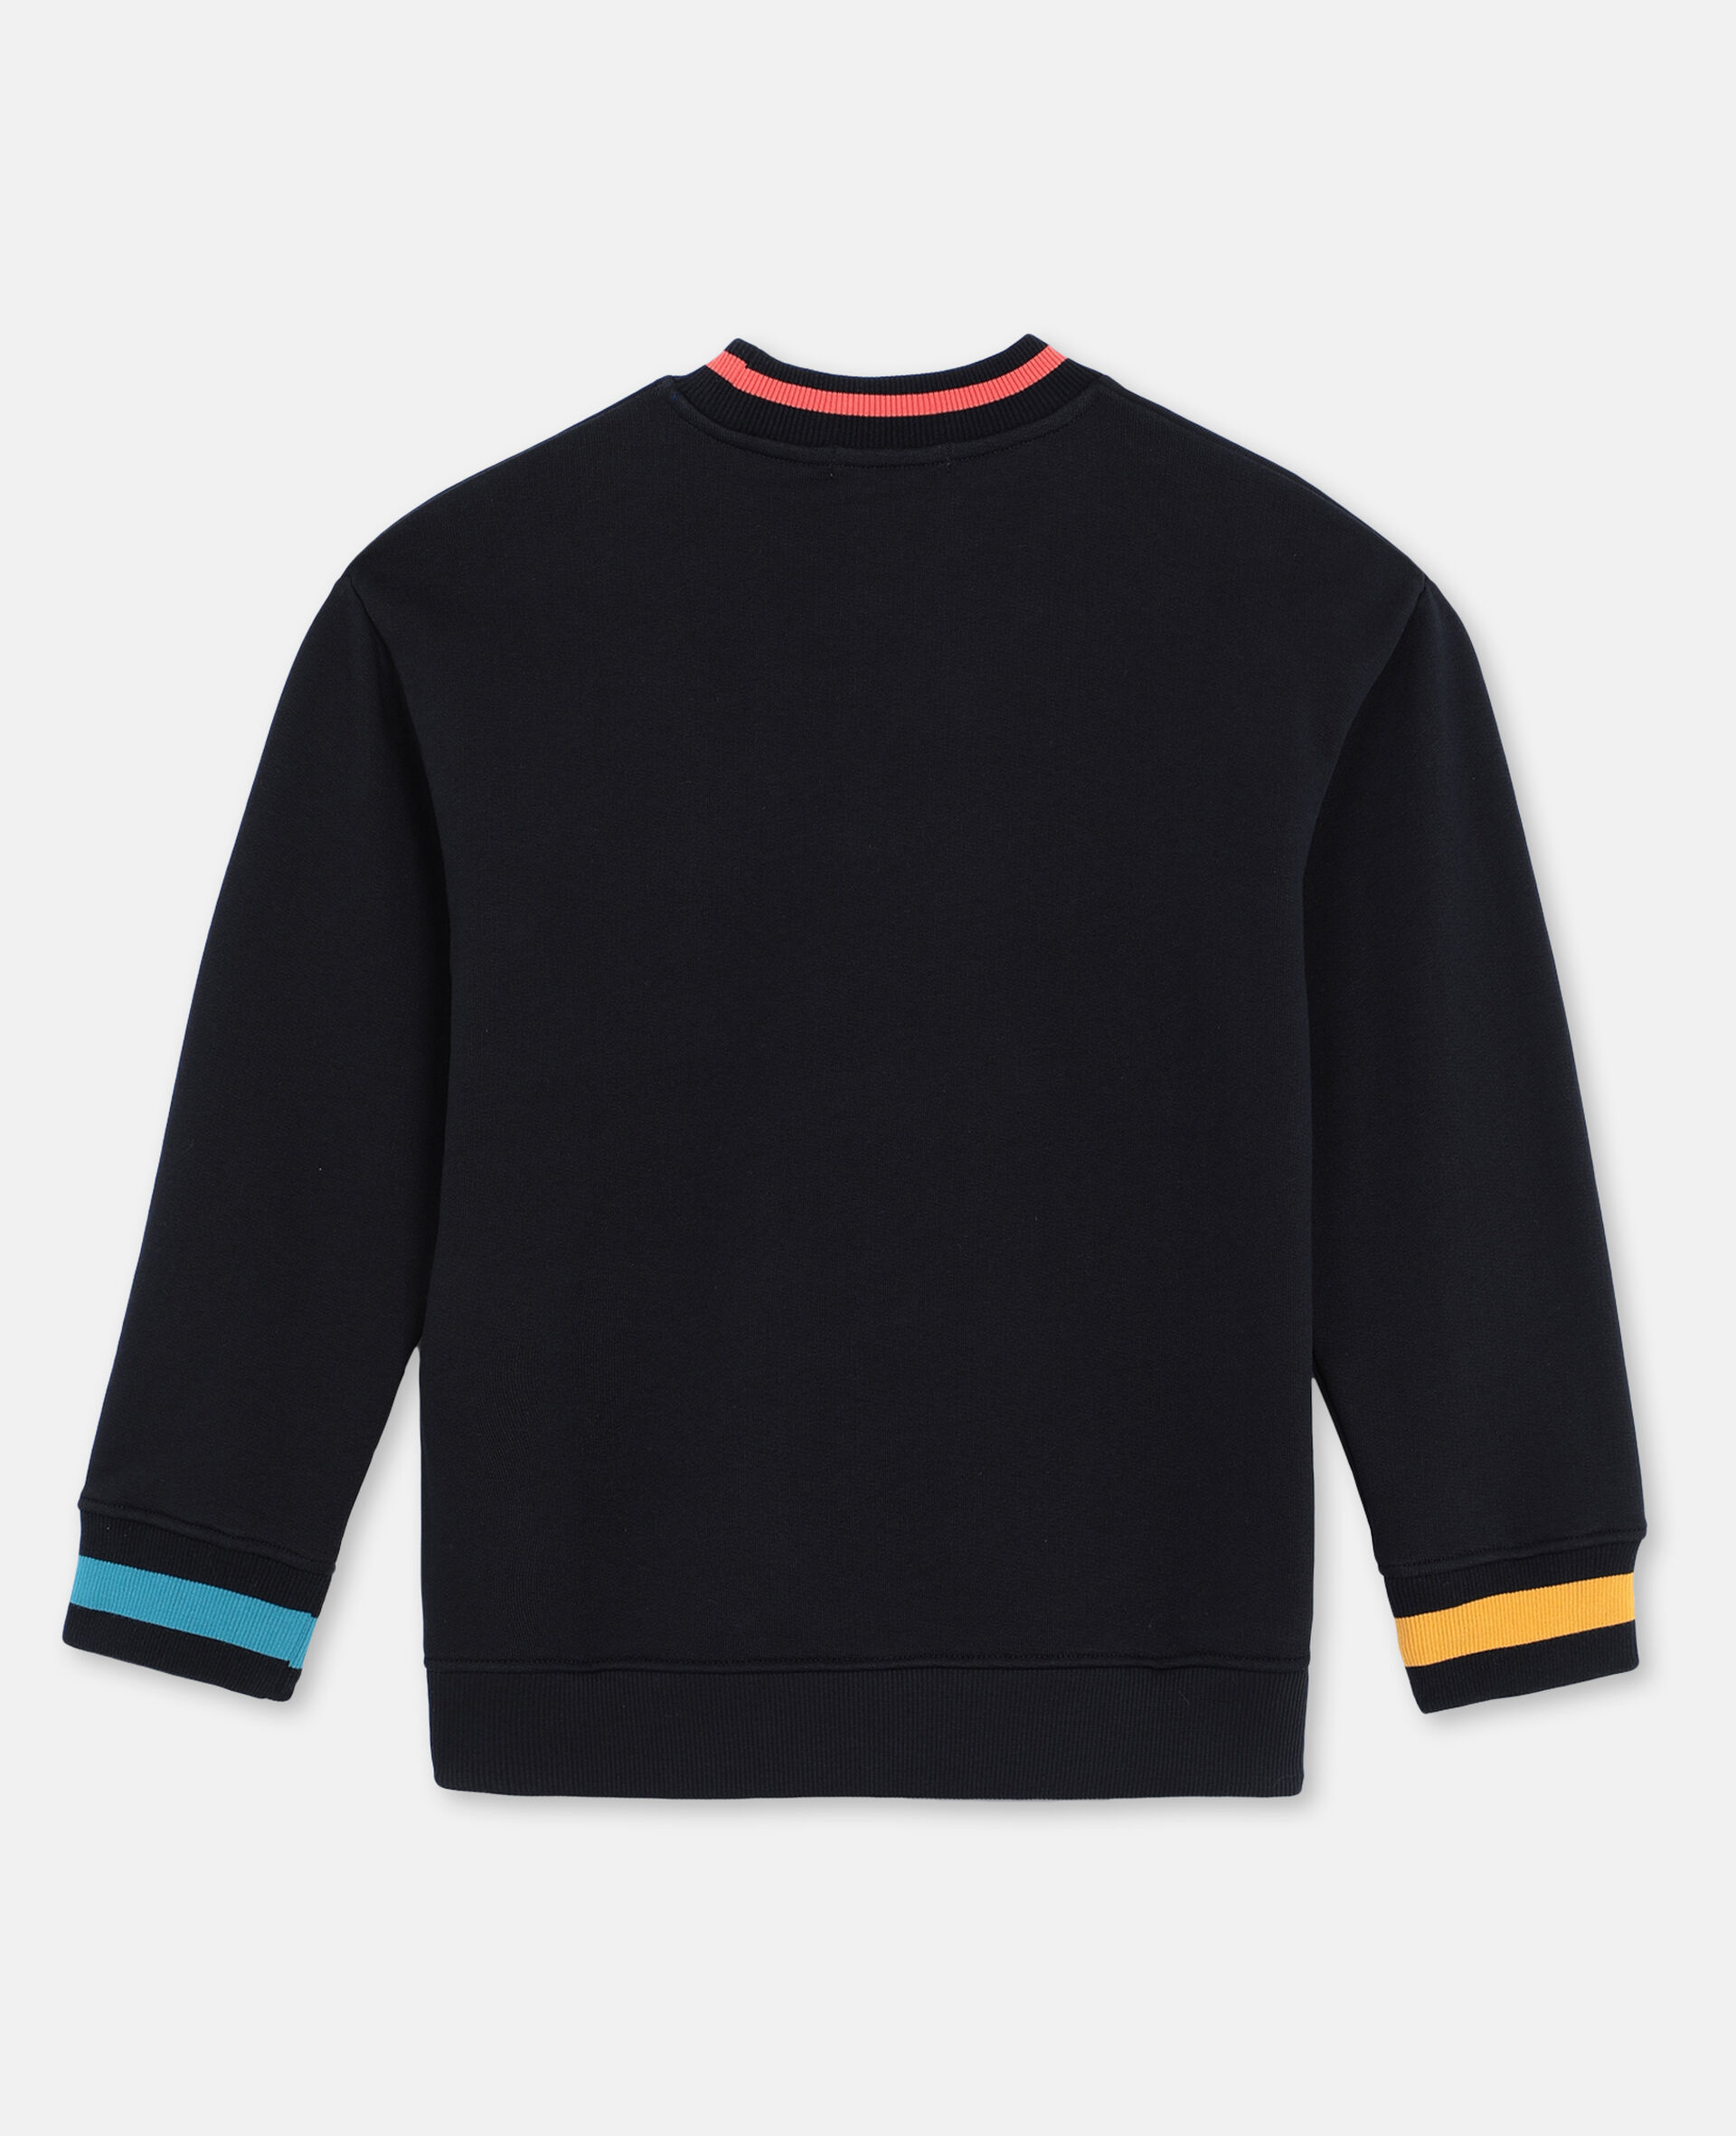 Oversize Skater Cotton Sweatshirt -Black-large image number 3